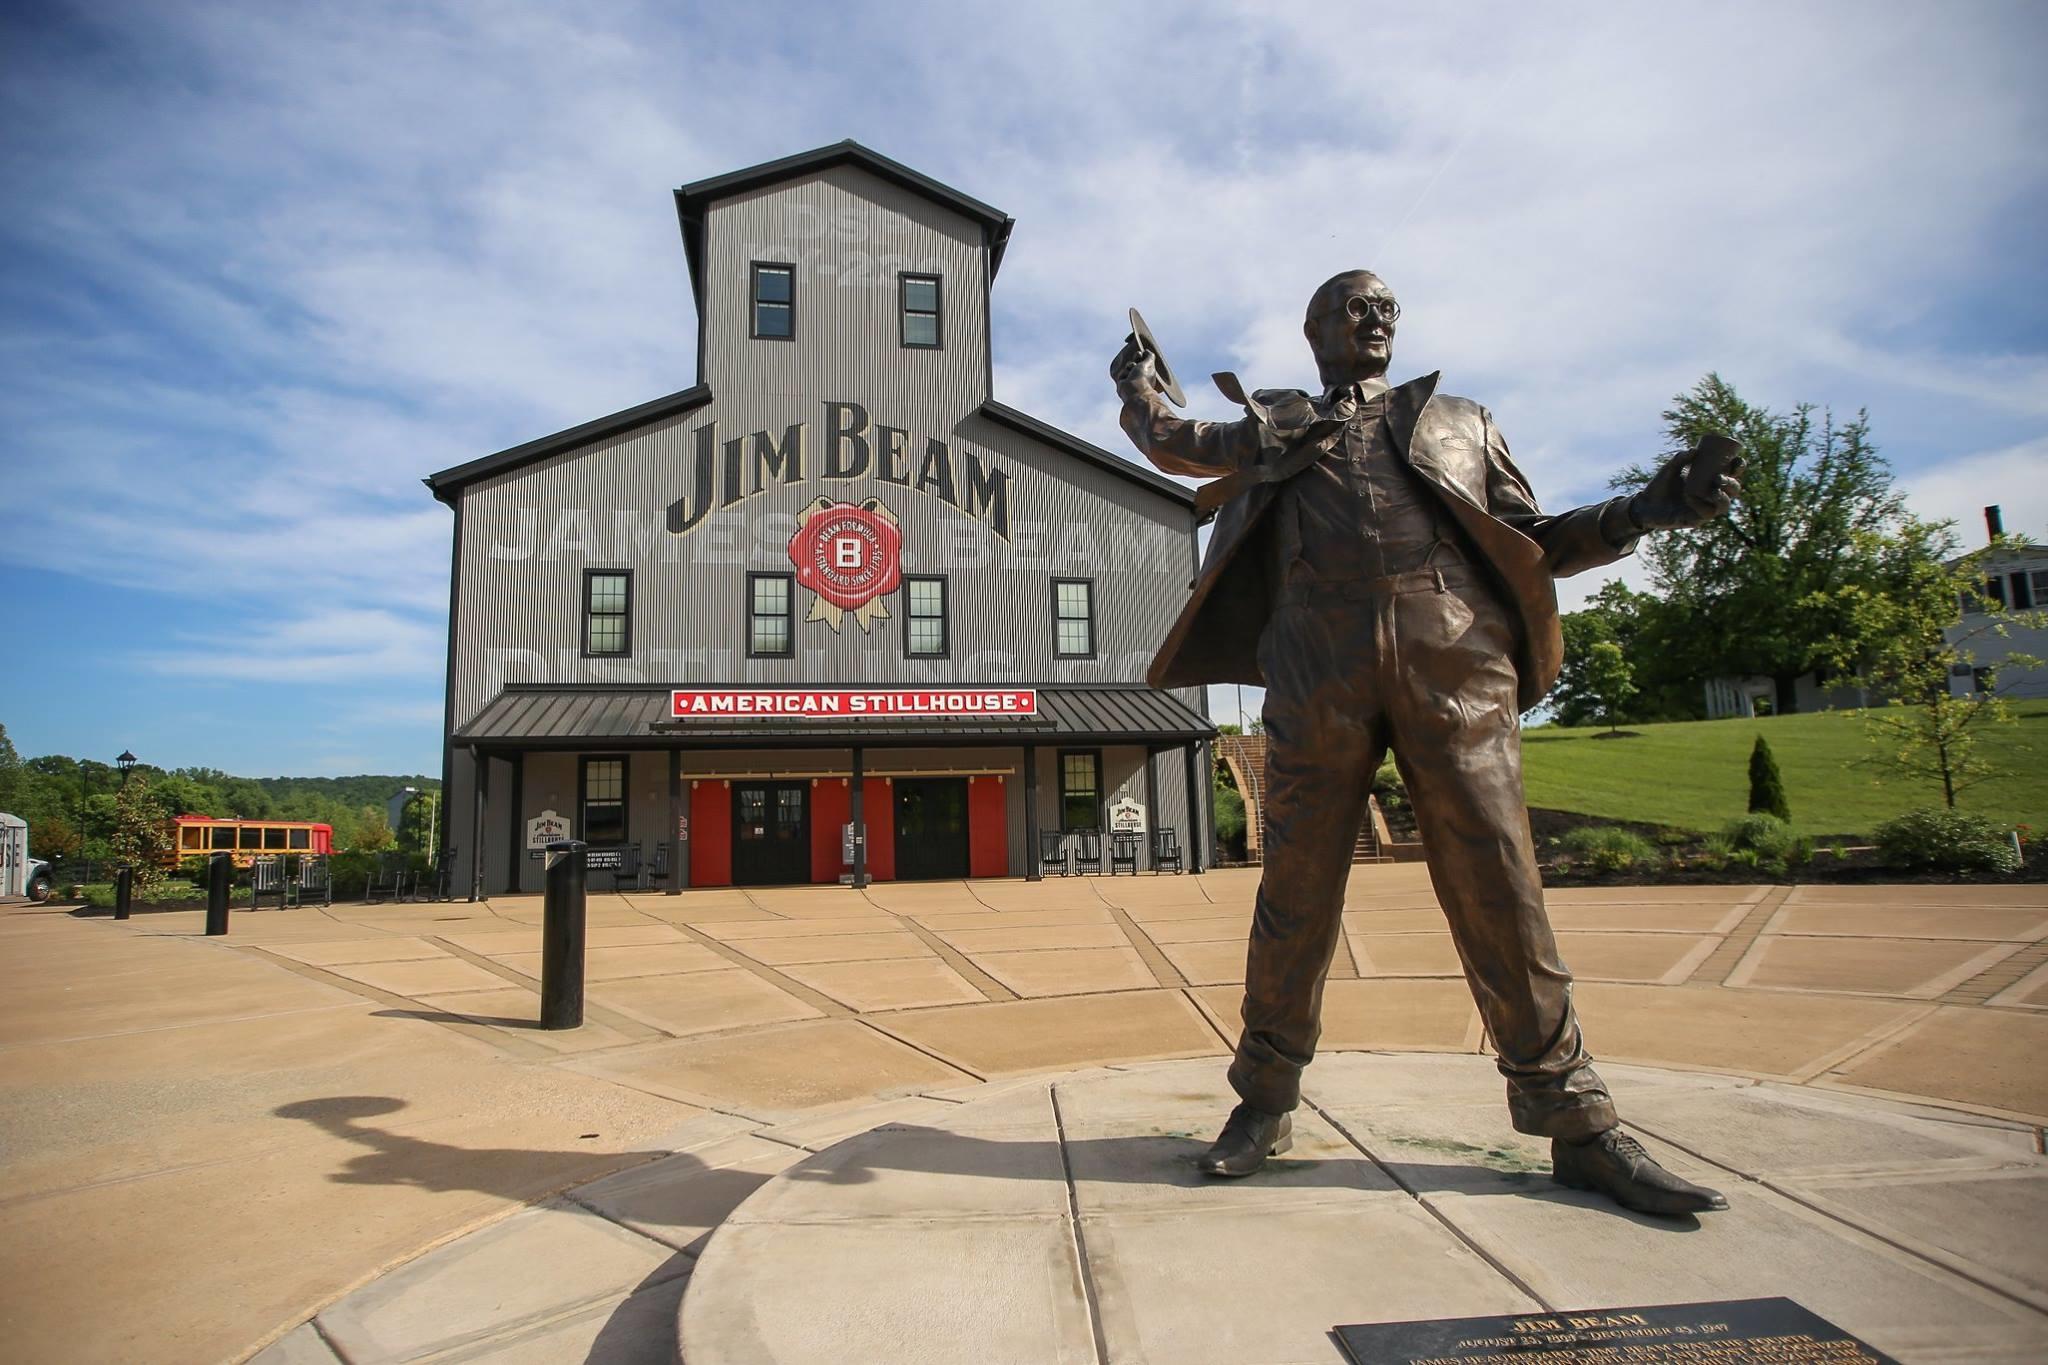 Jim Beam Distillery Tour Reviews